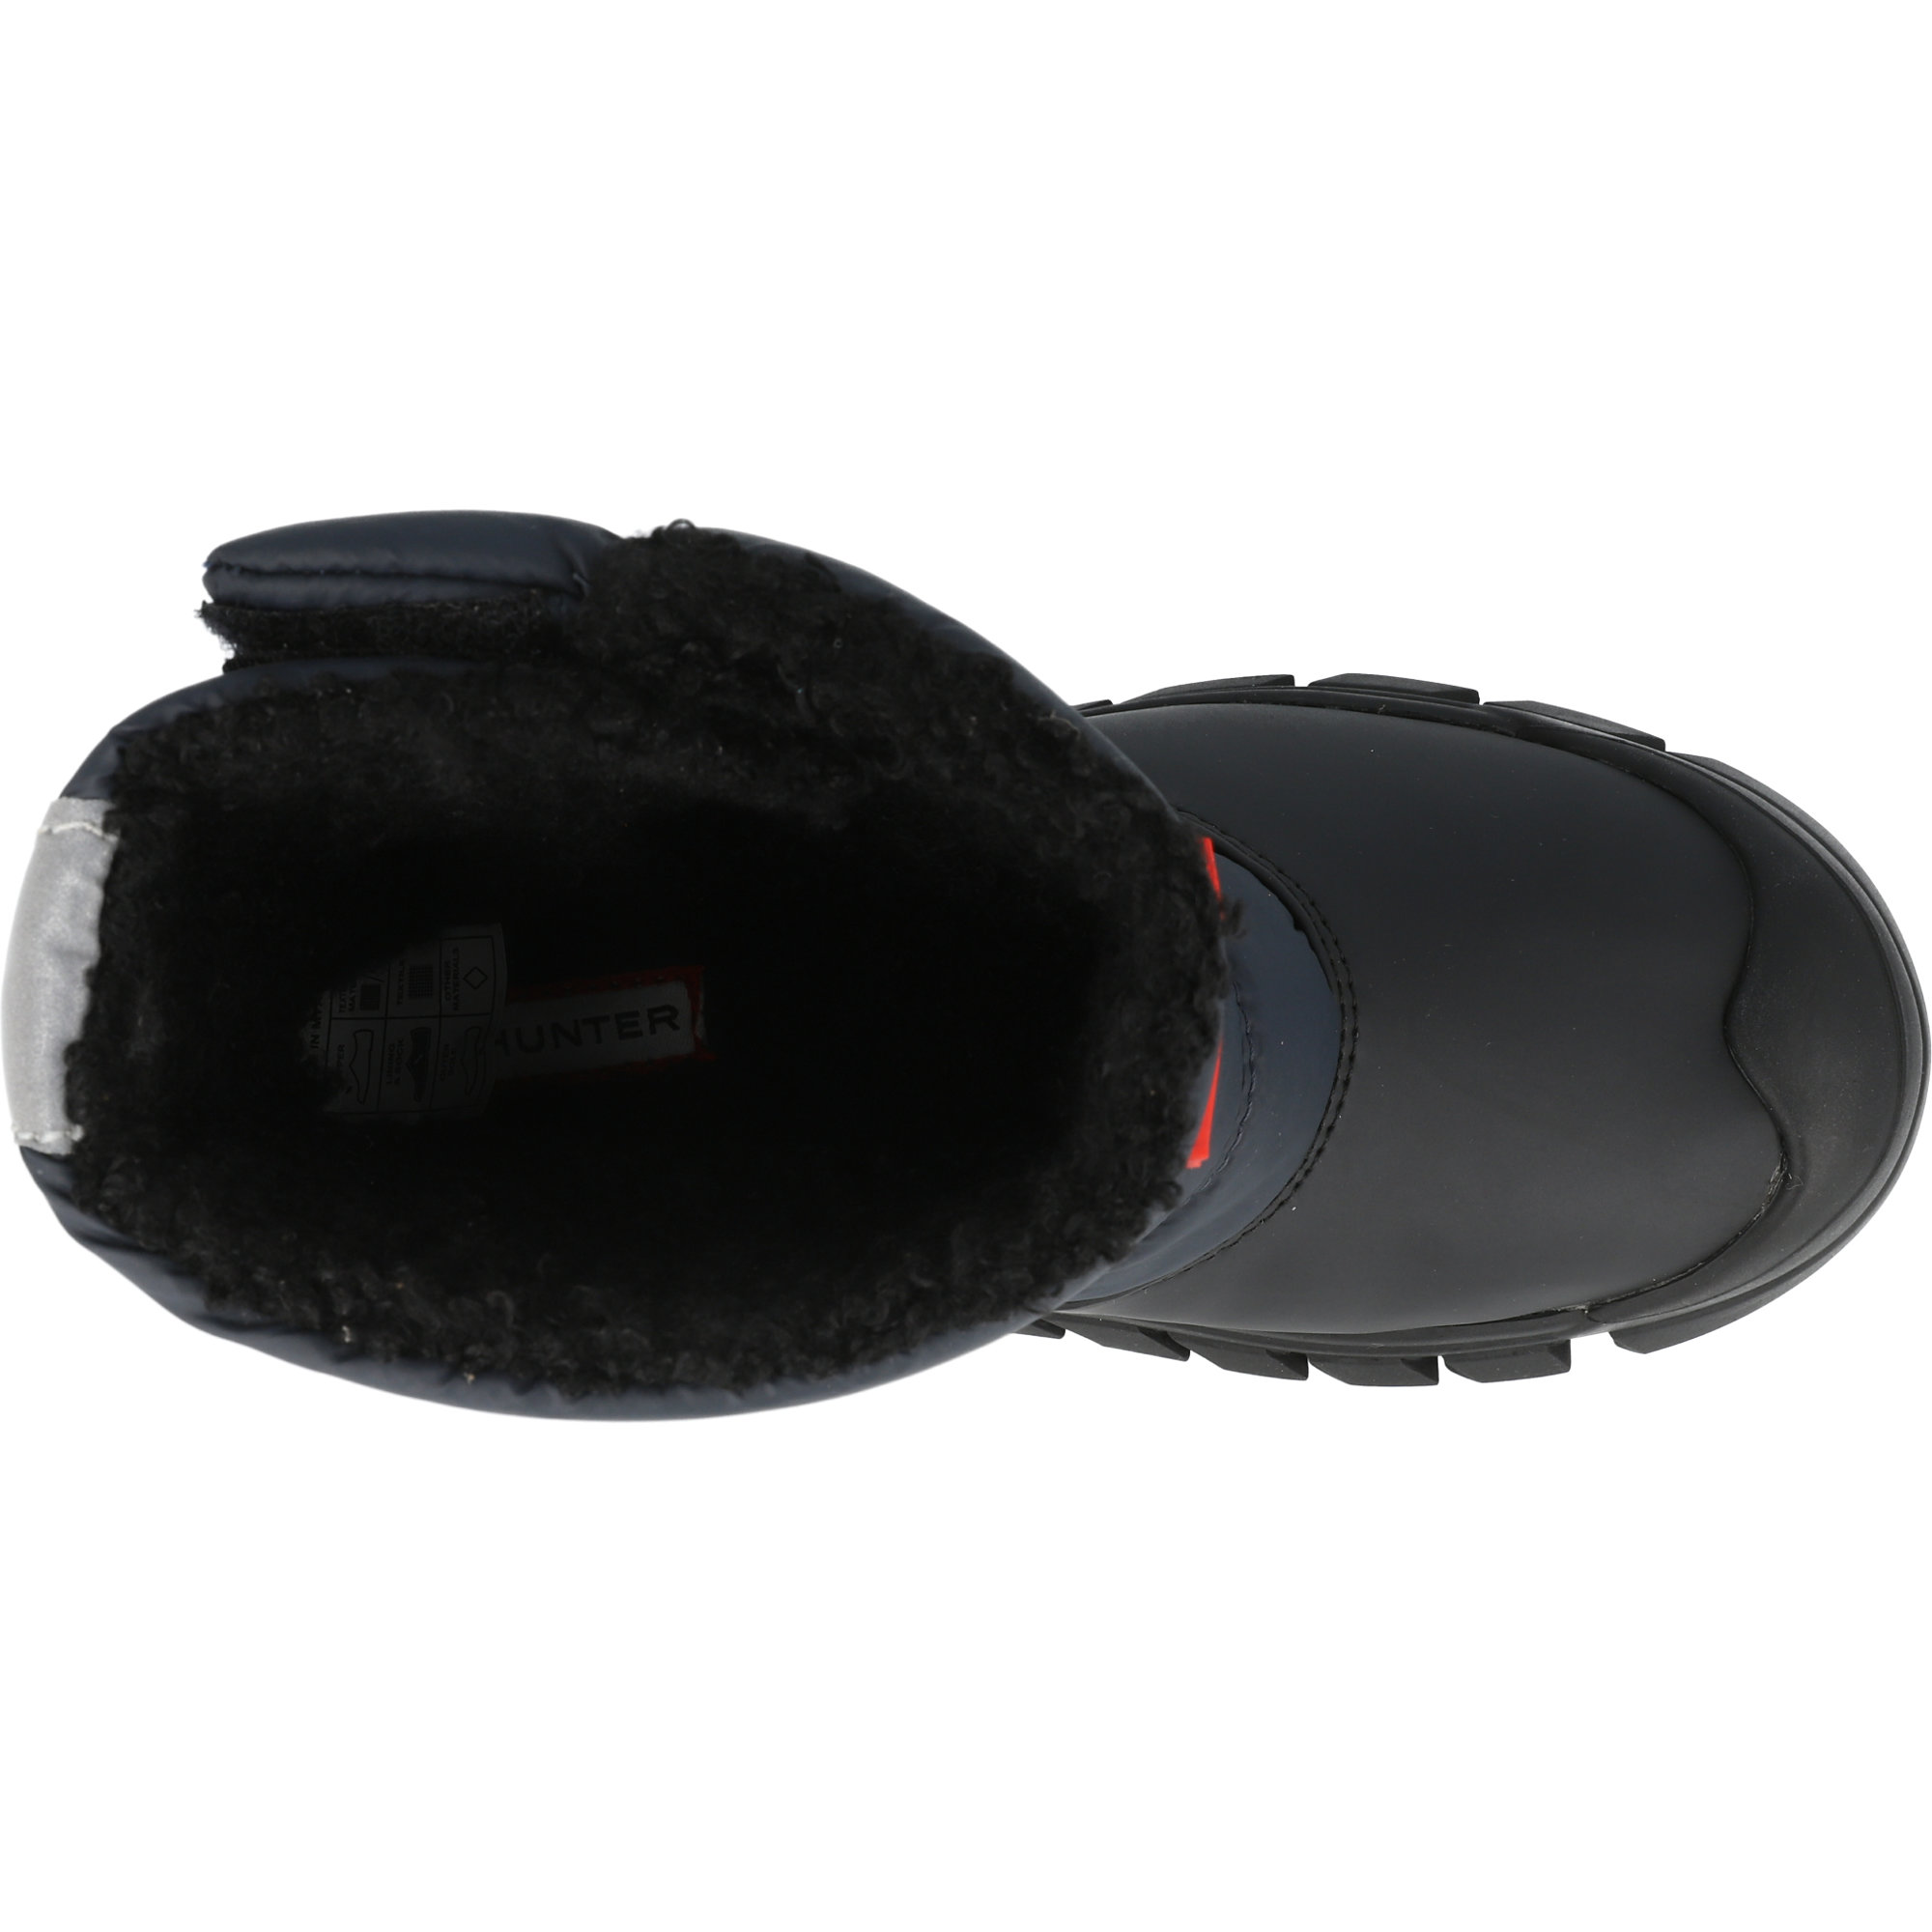 Hunter Original Kids Snow Boots Navy/Black Nylon